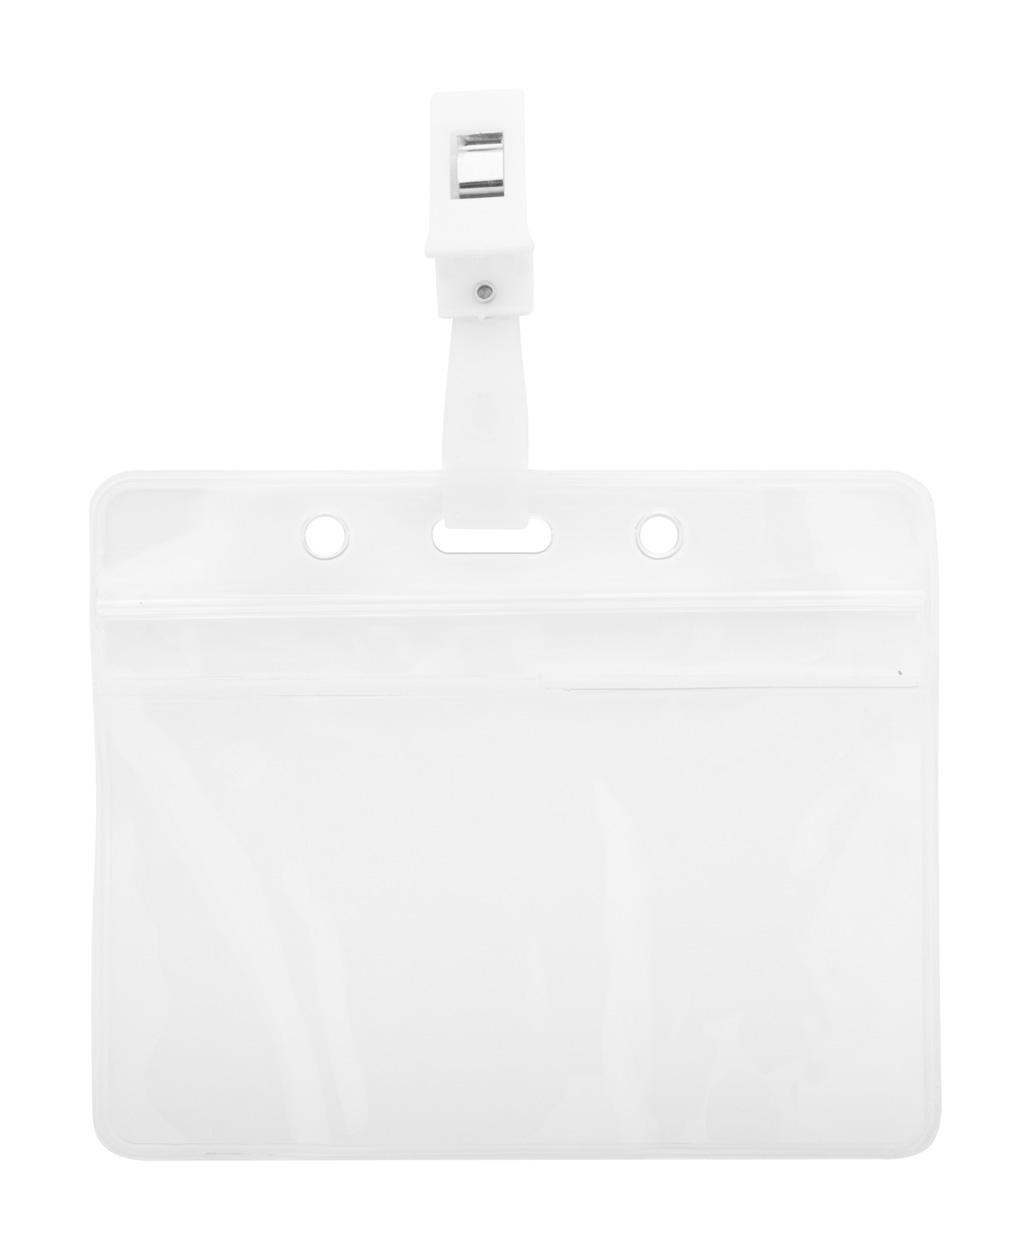 Solip badge holder, horizontal